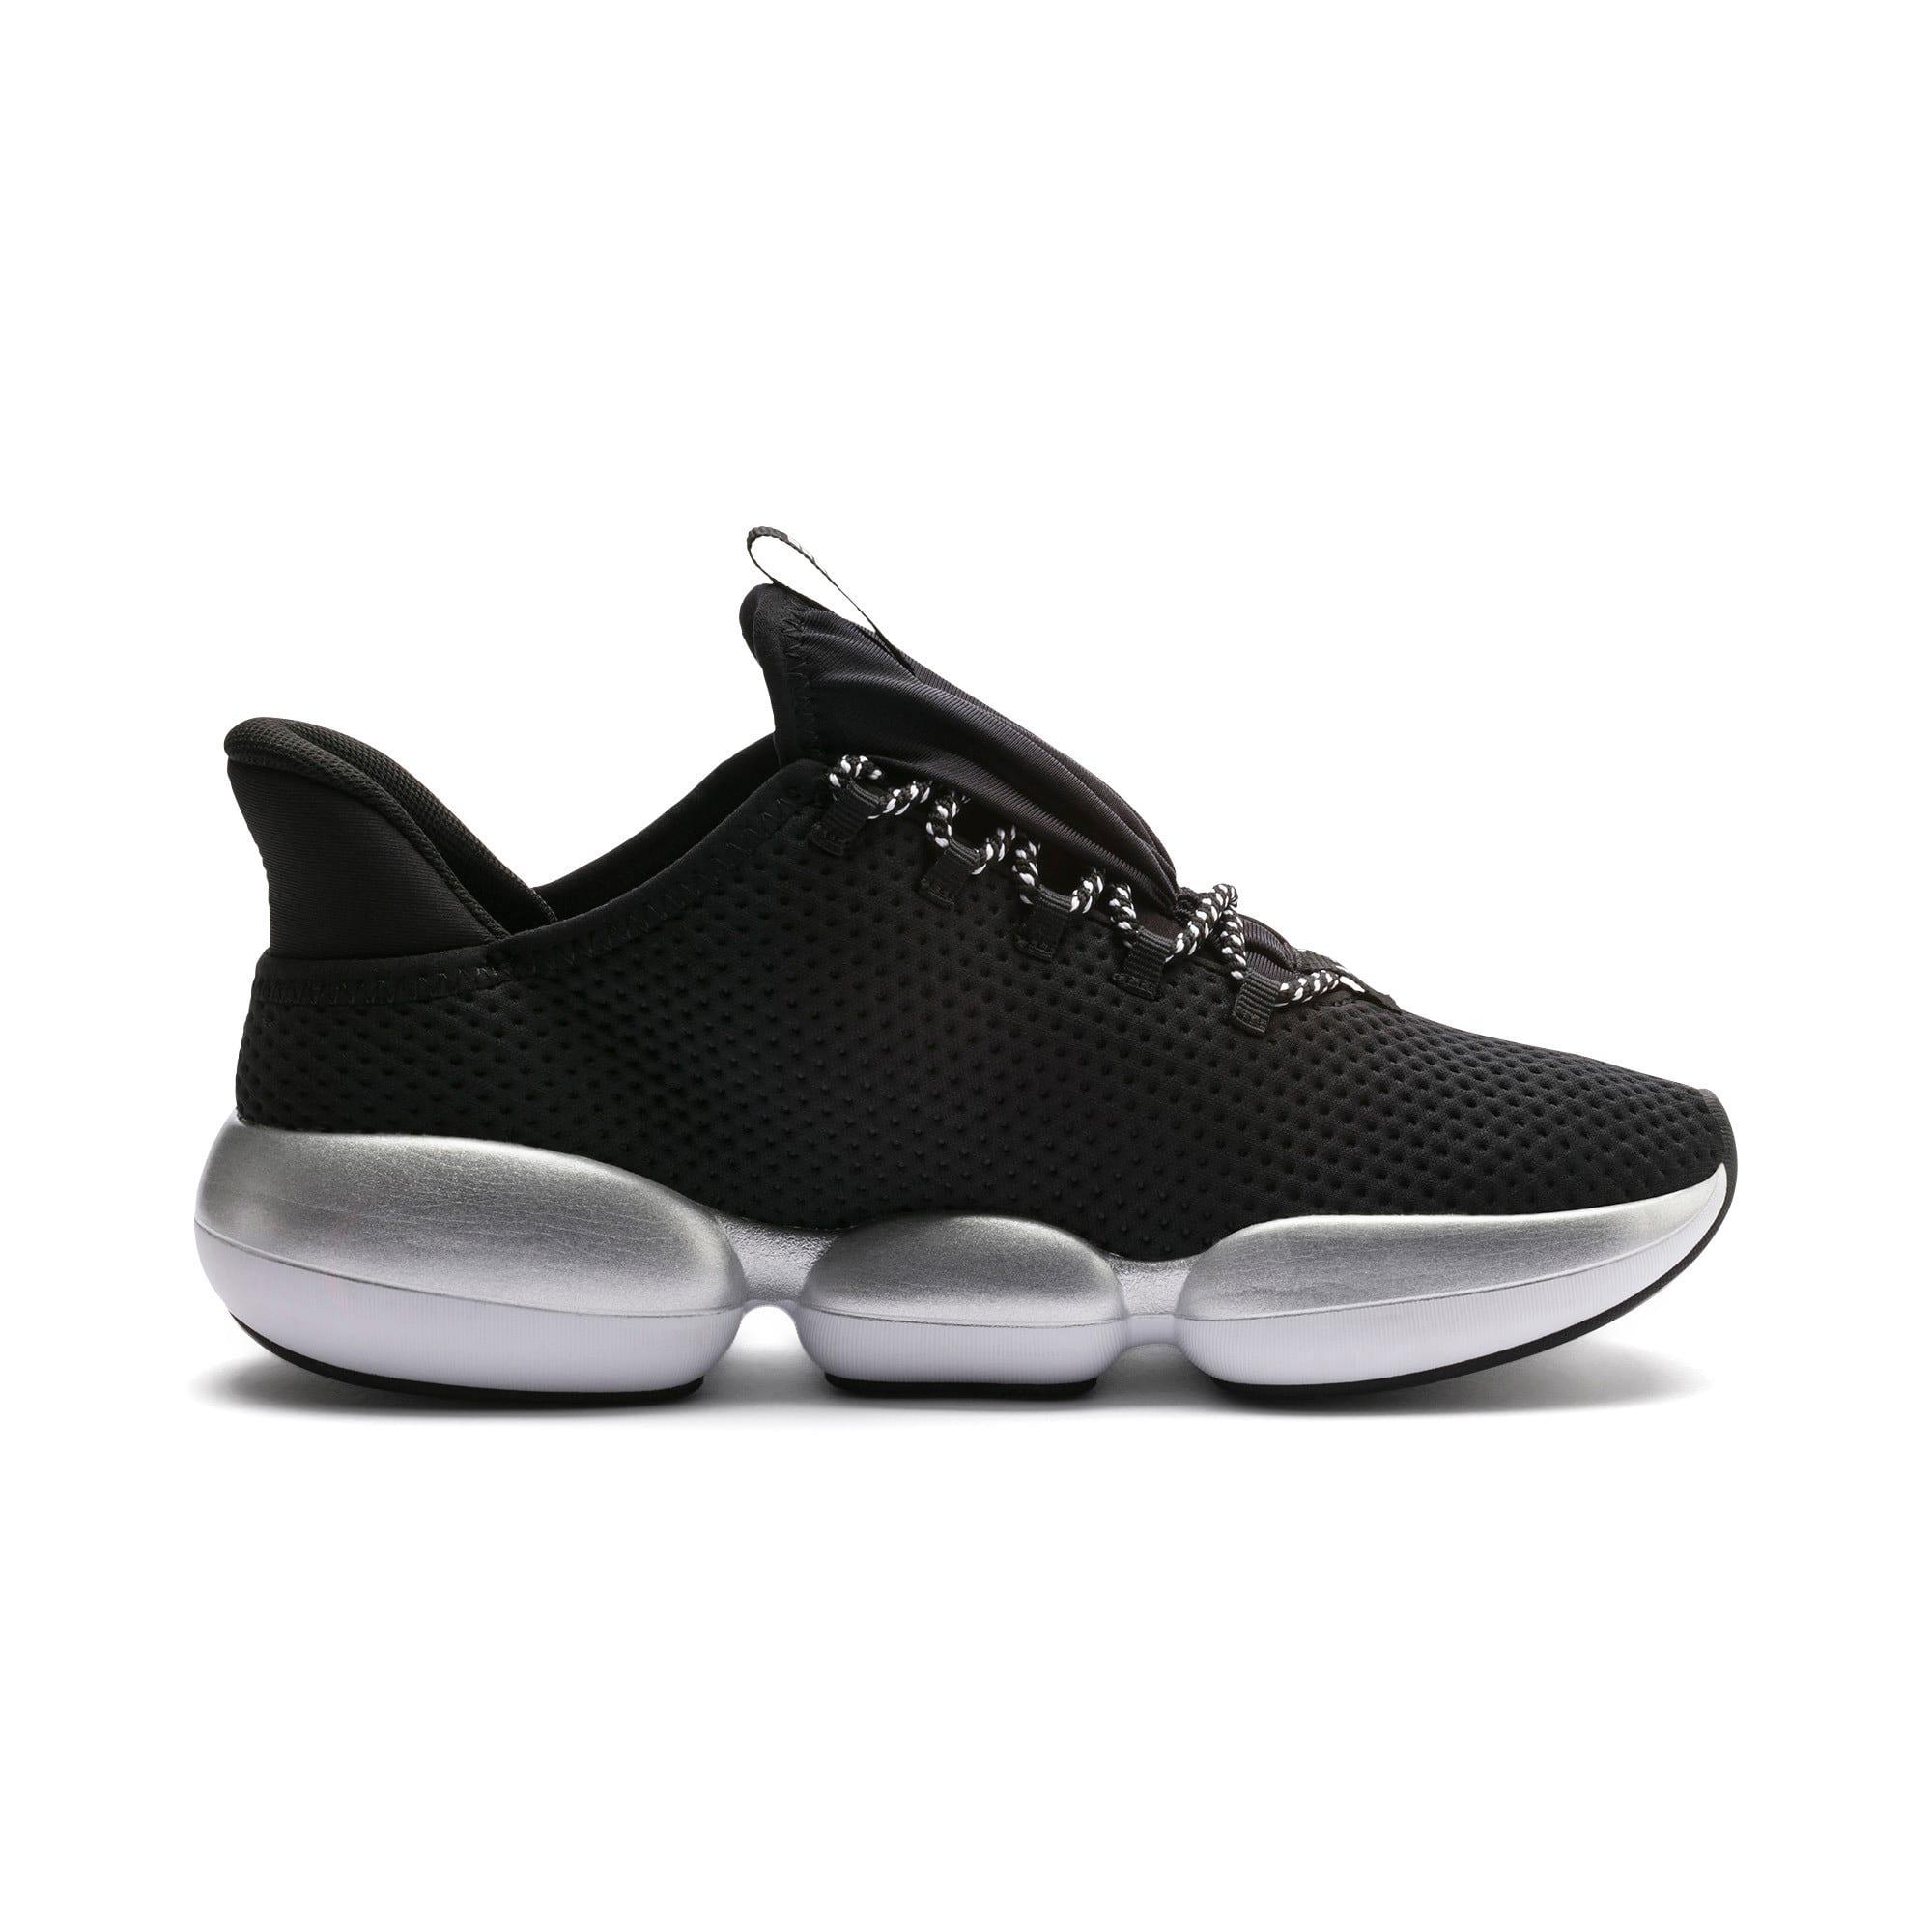 Imagen en miniatura 6 de Zapatillas de training de mujer Mode XT, Puma Black-Puma White, mediana